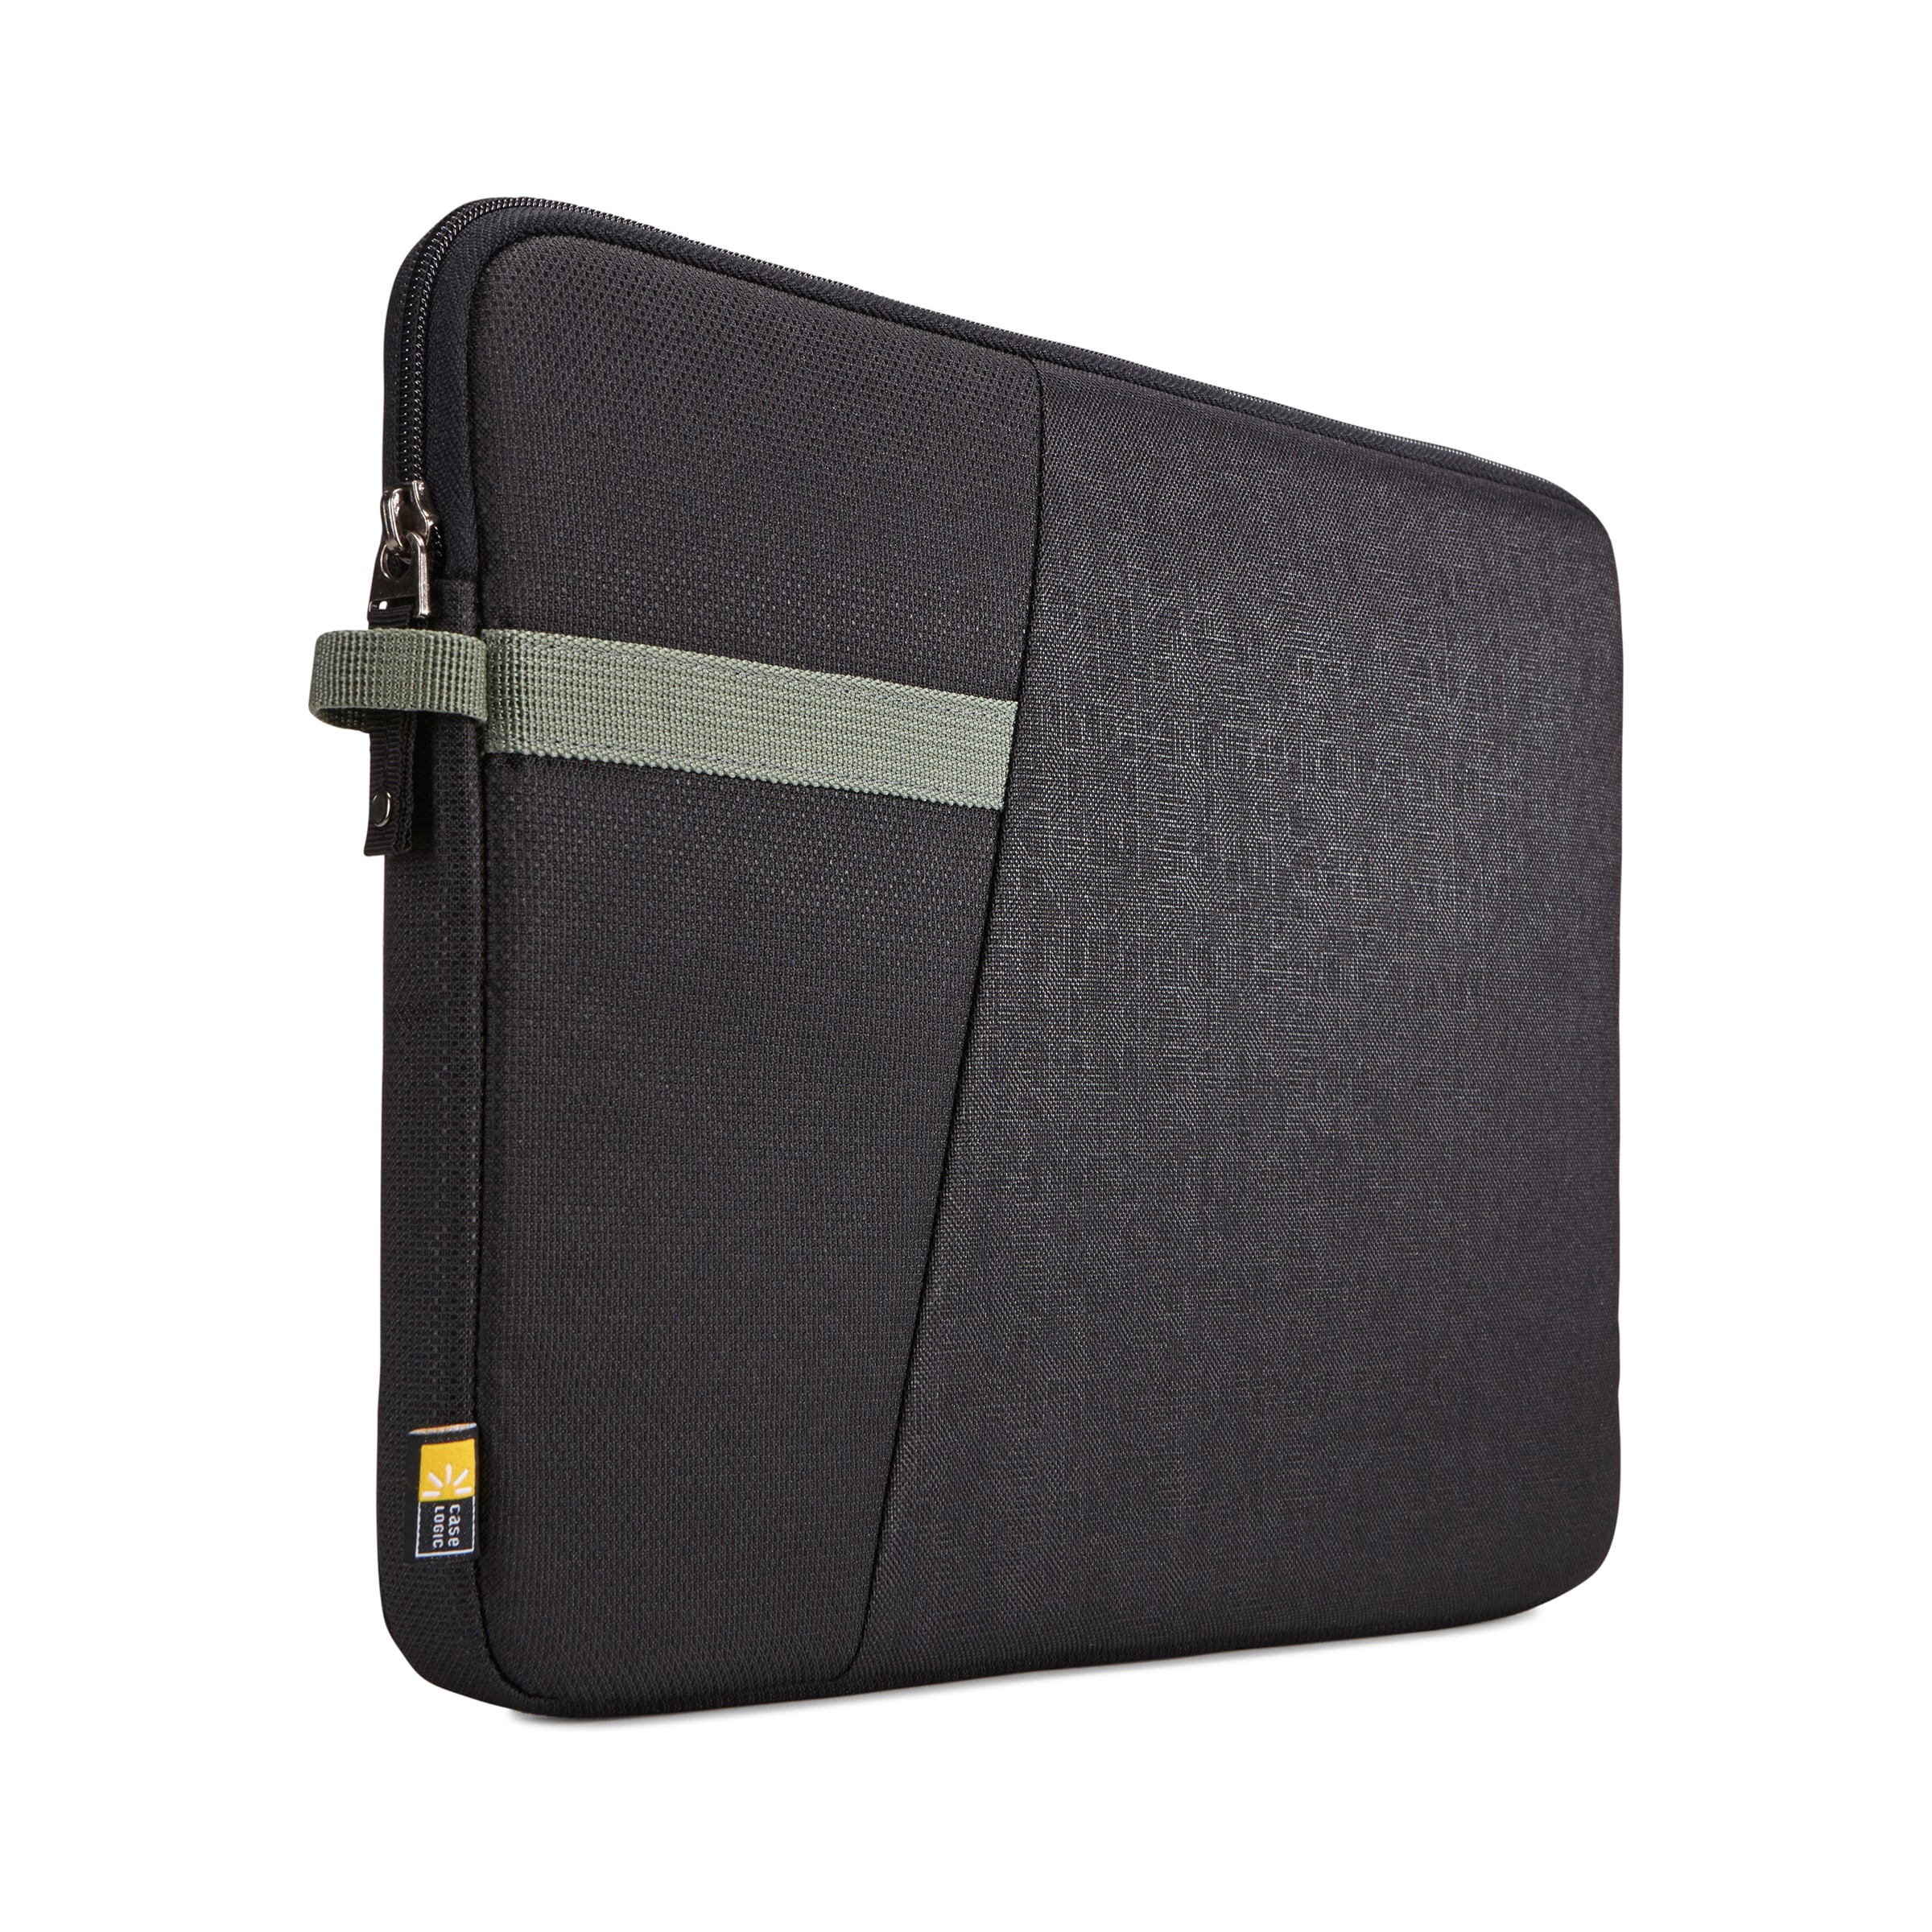 Bestandsnaam: Ibra-13_3--laptop-sleeve-4.jpg Afmetingen: 2400 x 2400 pixels Bestandsgrootte: 826.74 KB